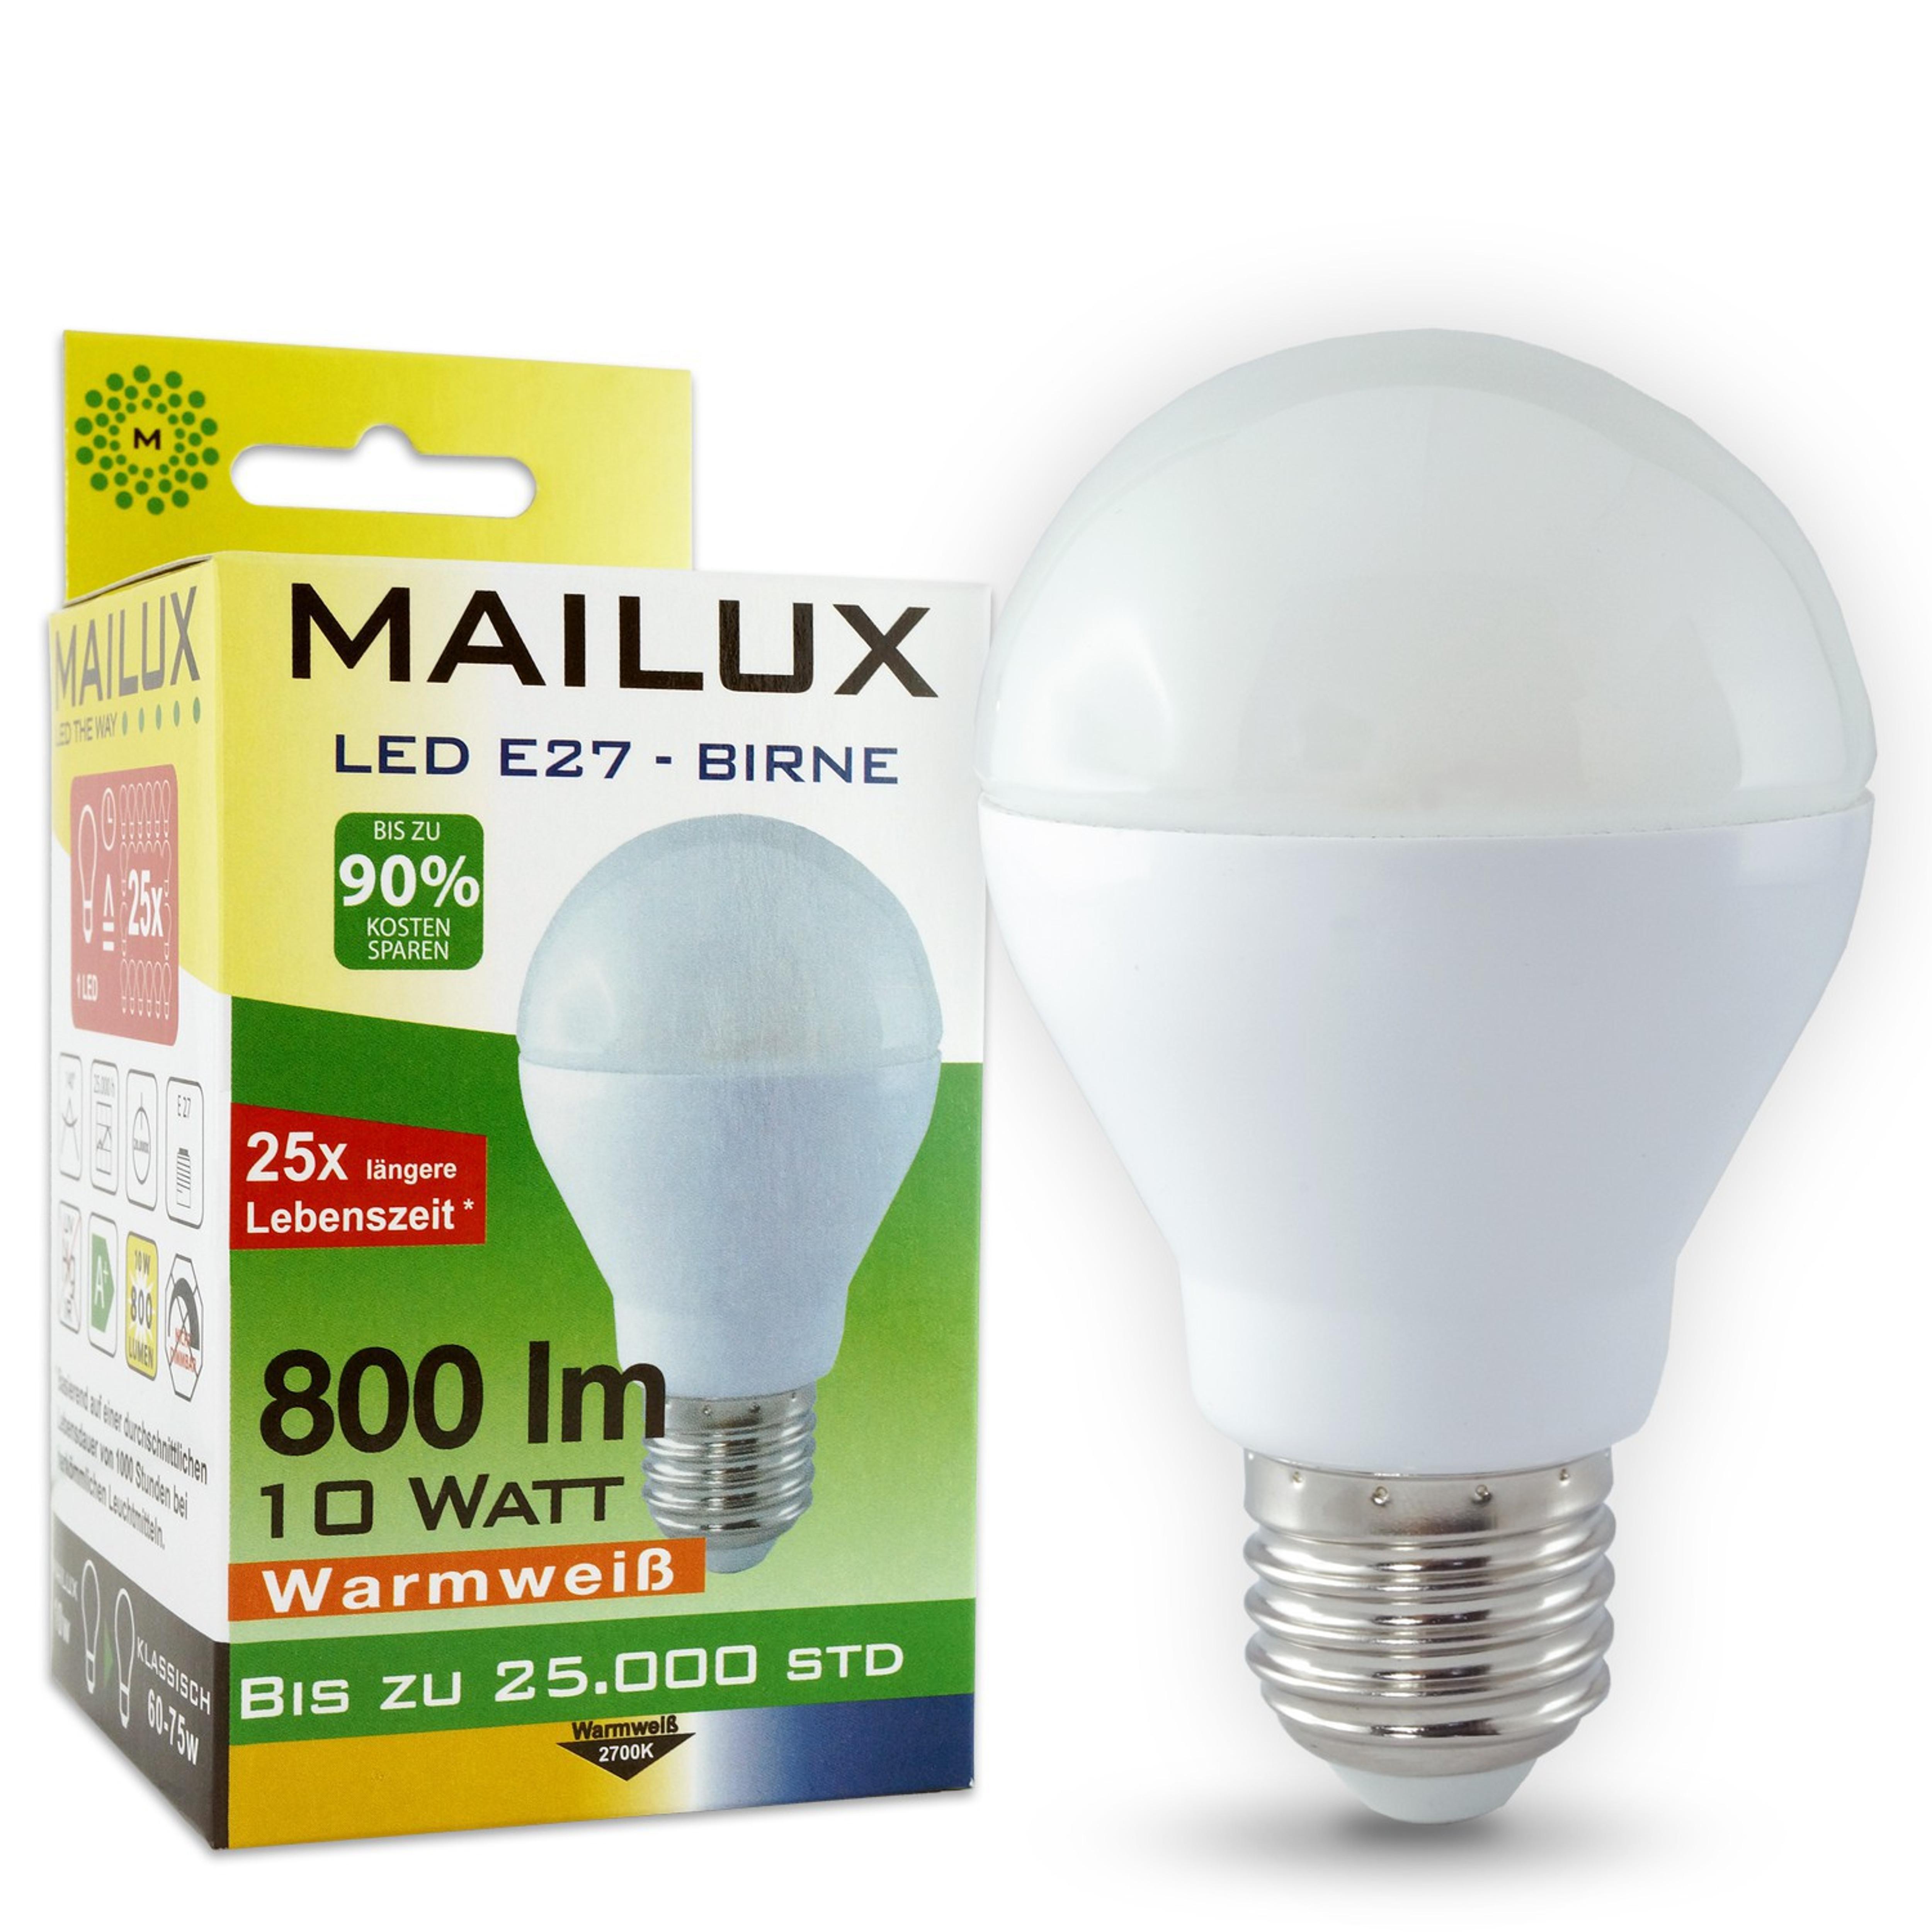 mailux e27 10 watt led matt bulb warmes licht 800lm von. Black Bedroom Furniture Sets. Home Design Ideas